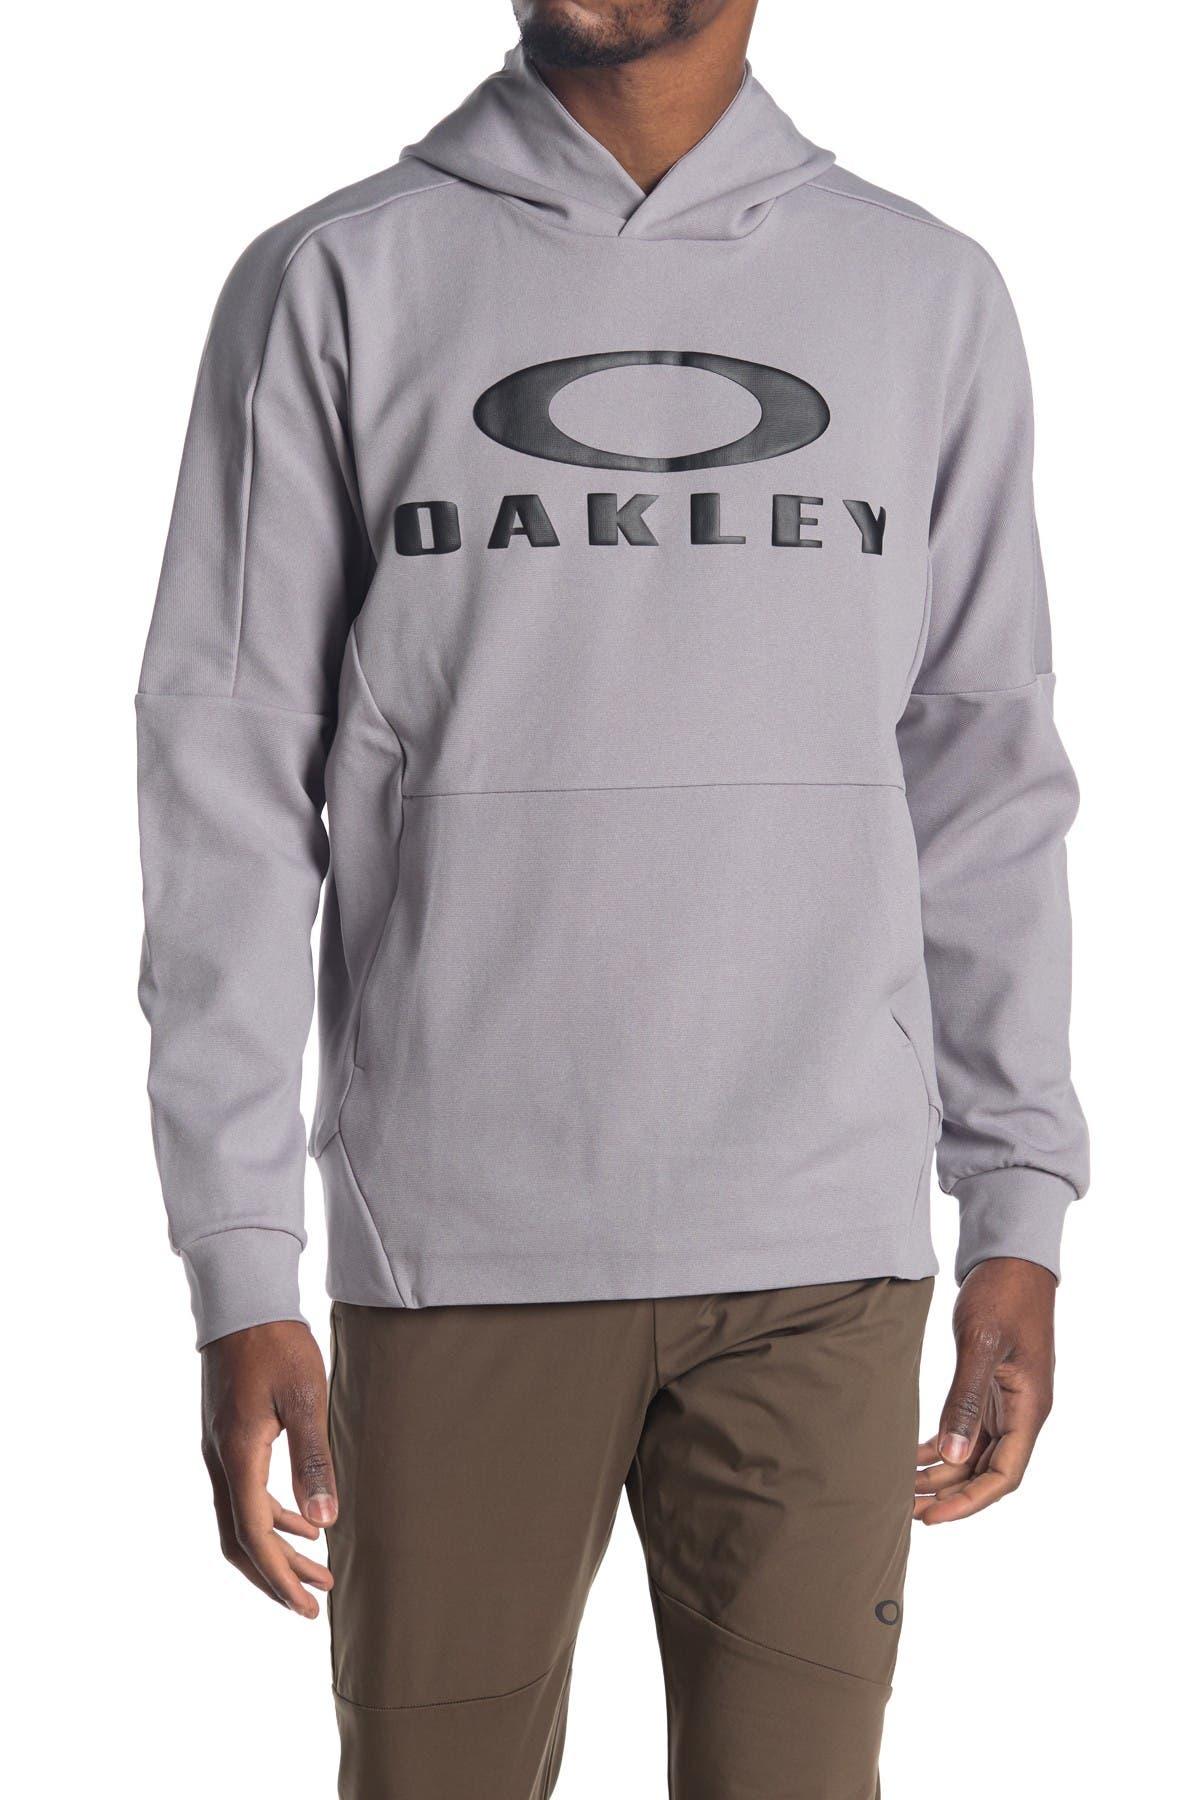 Image of Oakley Enhance Mobility Fleece Pullover Hoodie